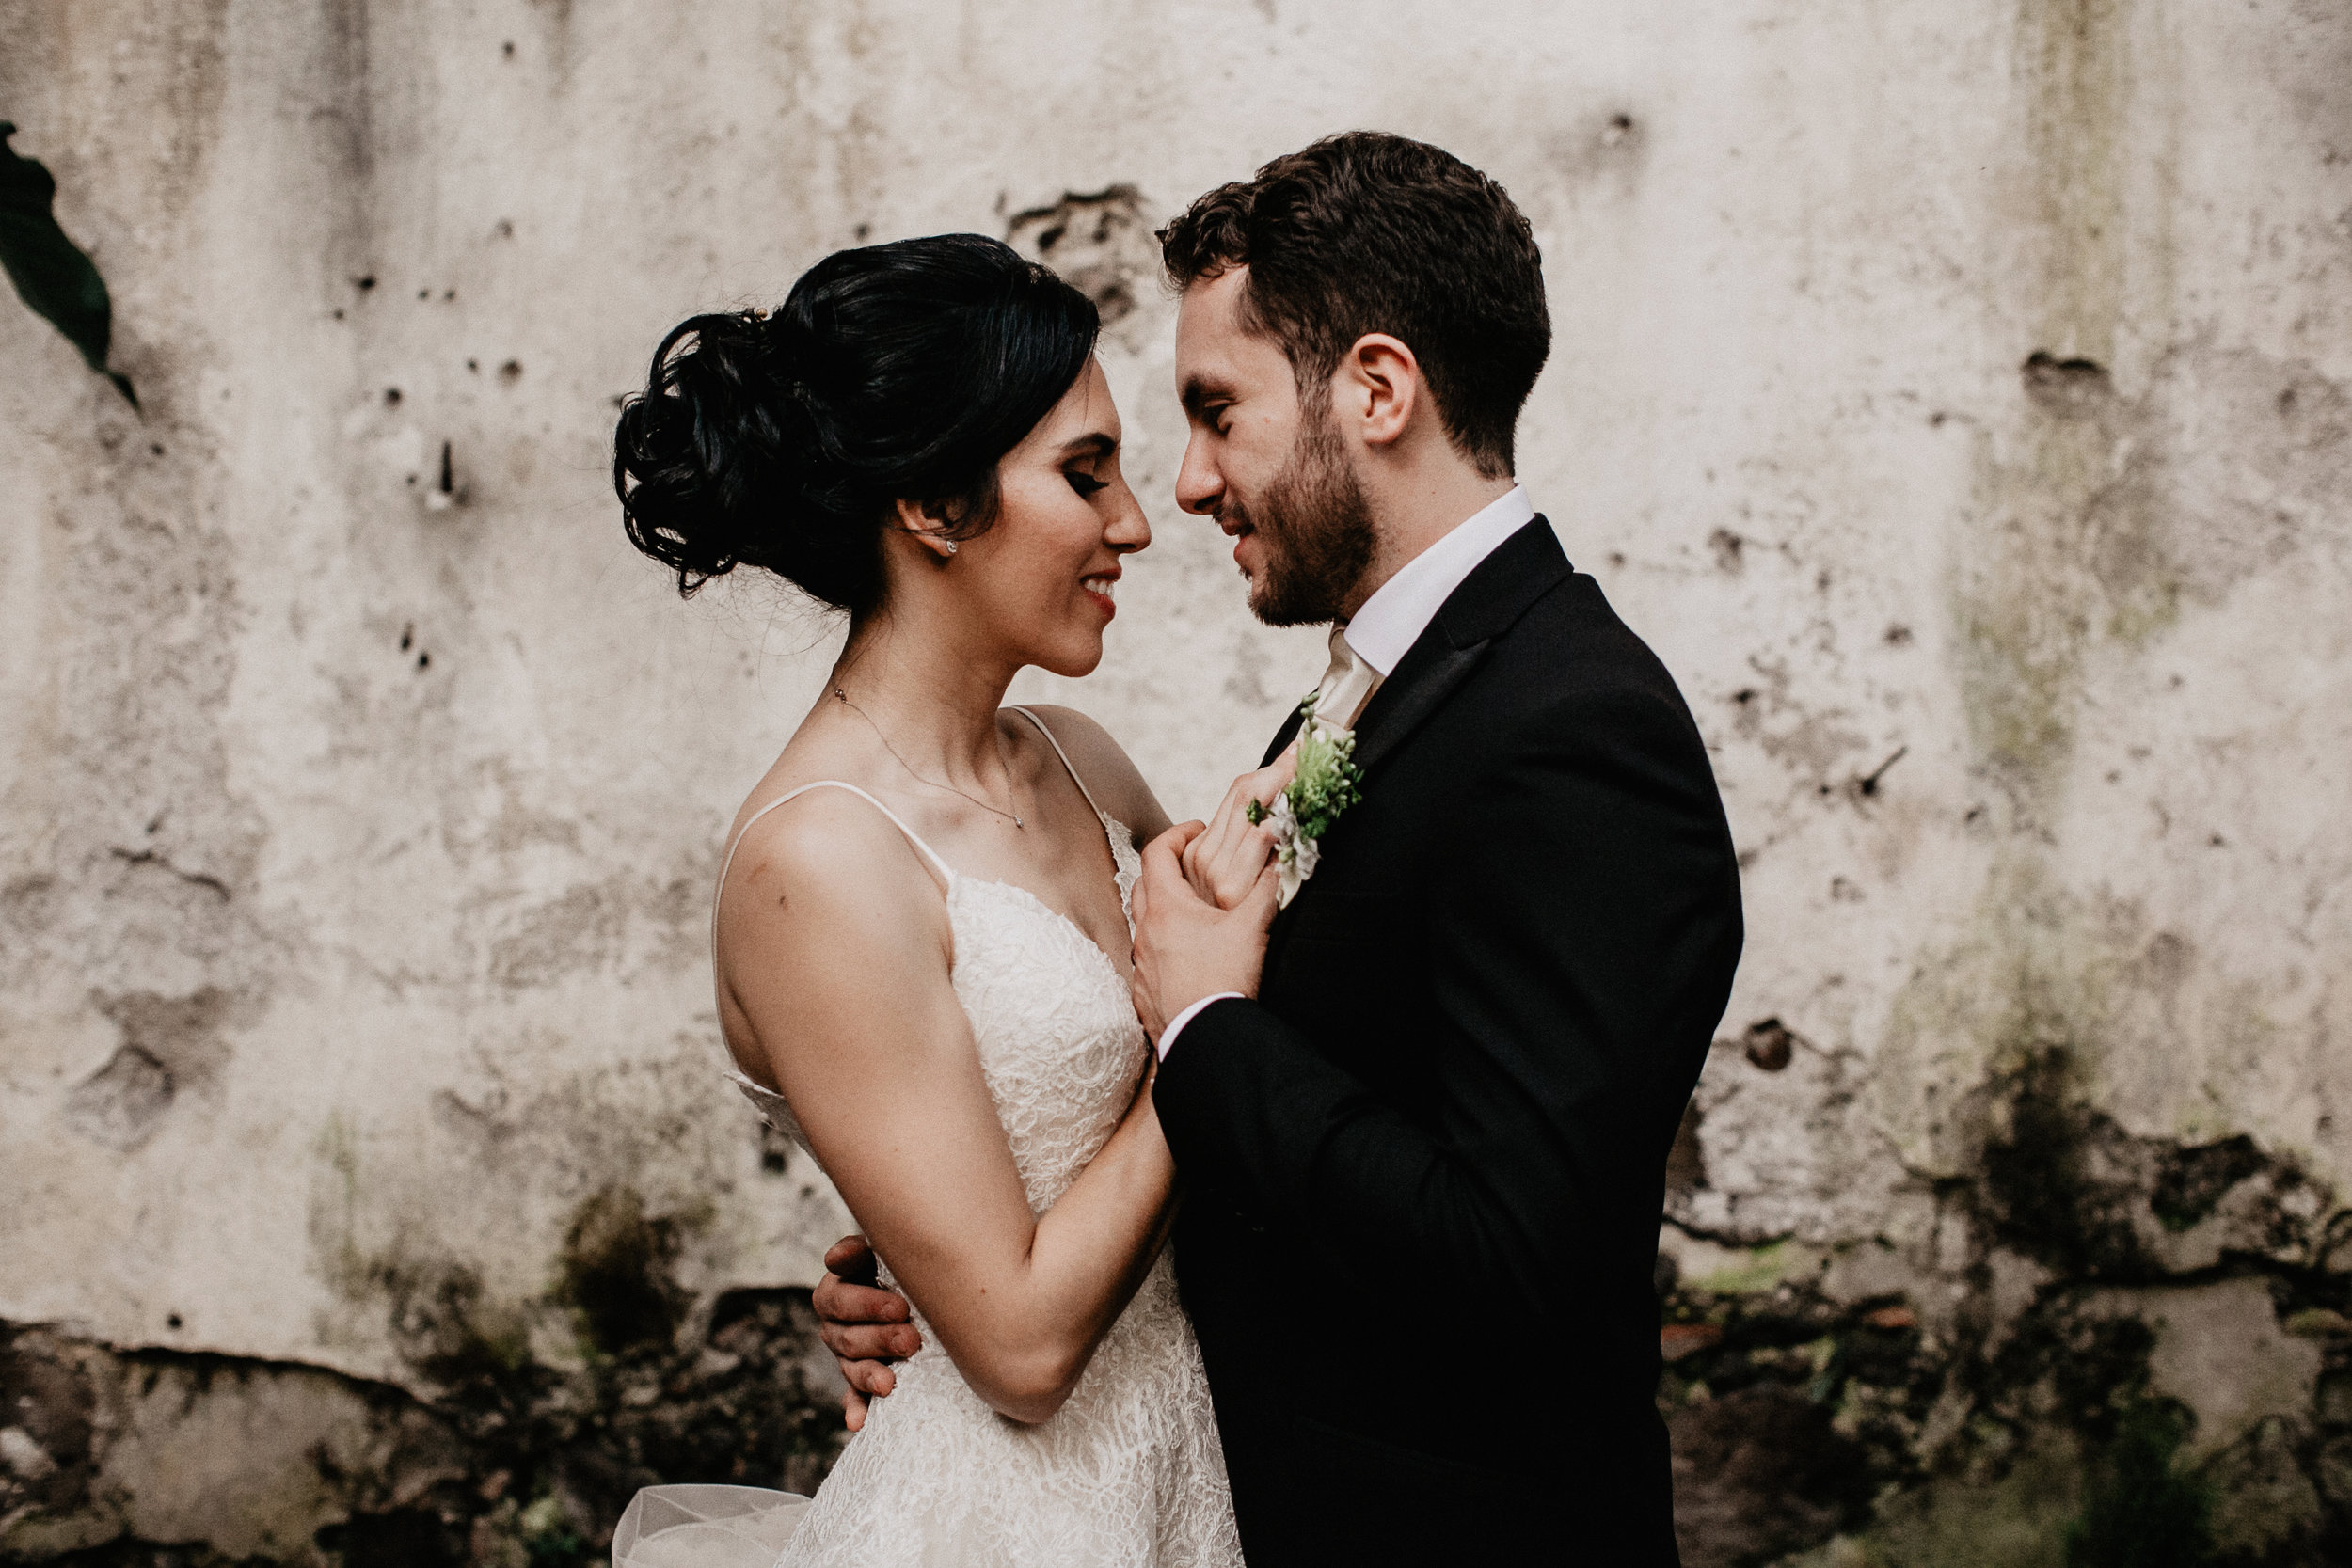 Alfonso_flores_destination_wedding_photography_vanesa_carlos-869.JPG